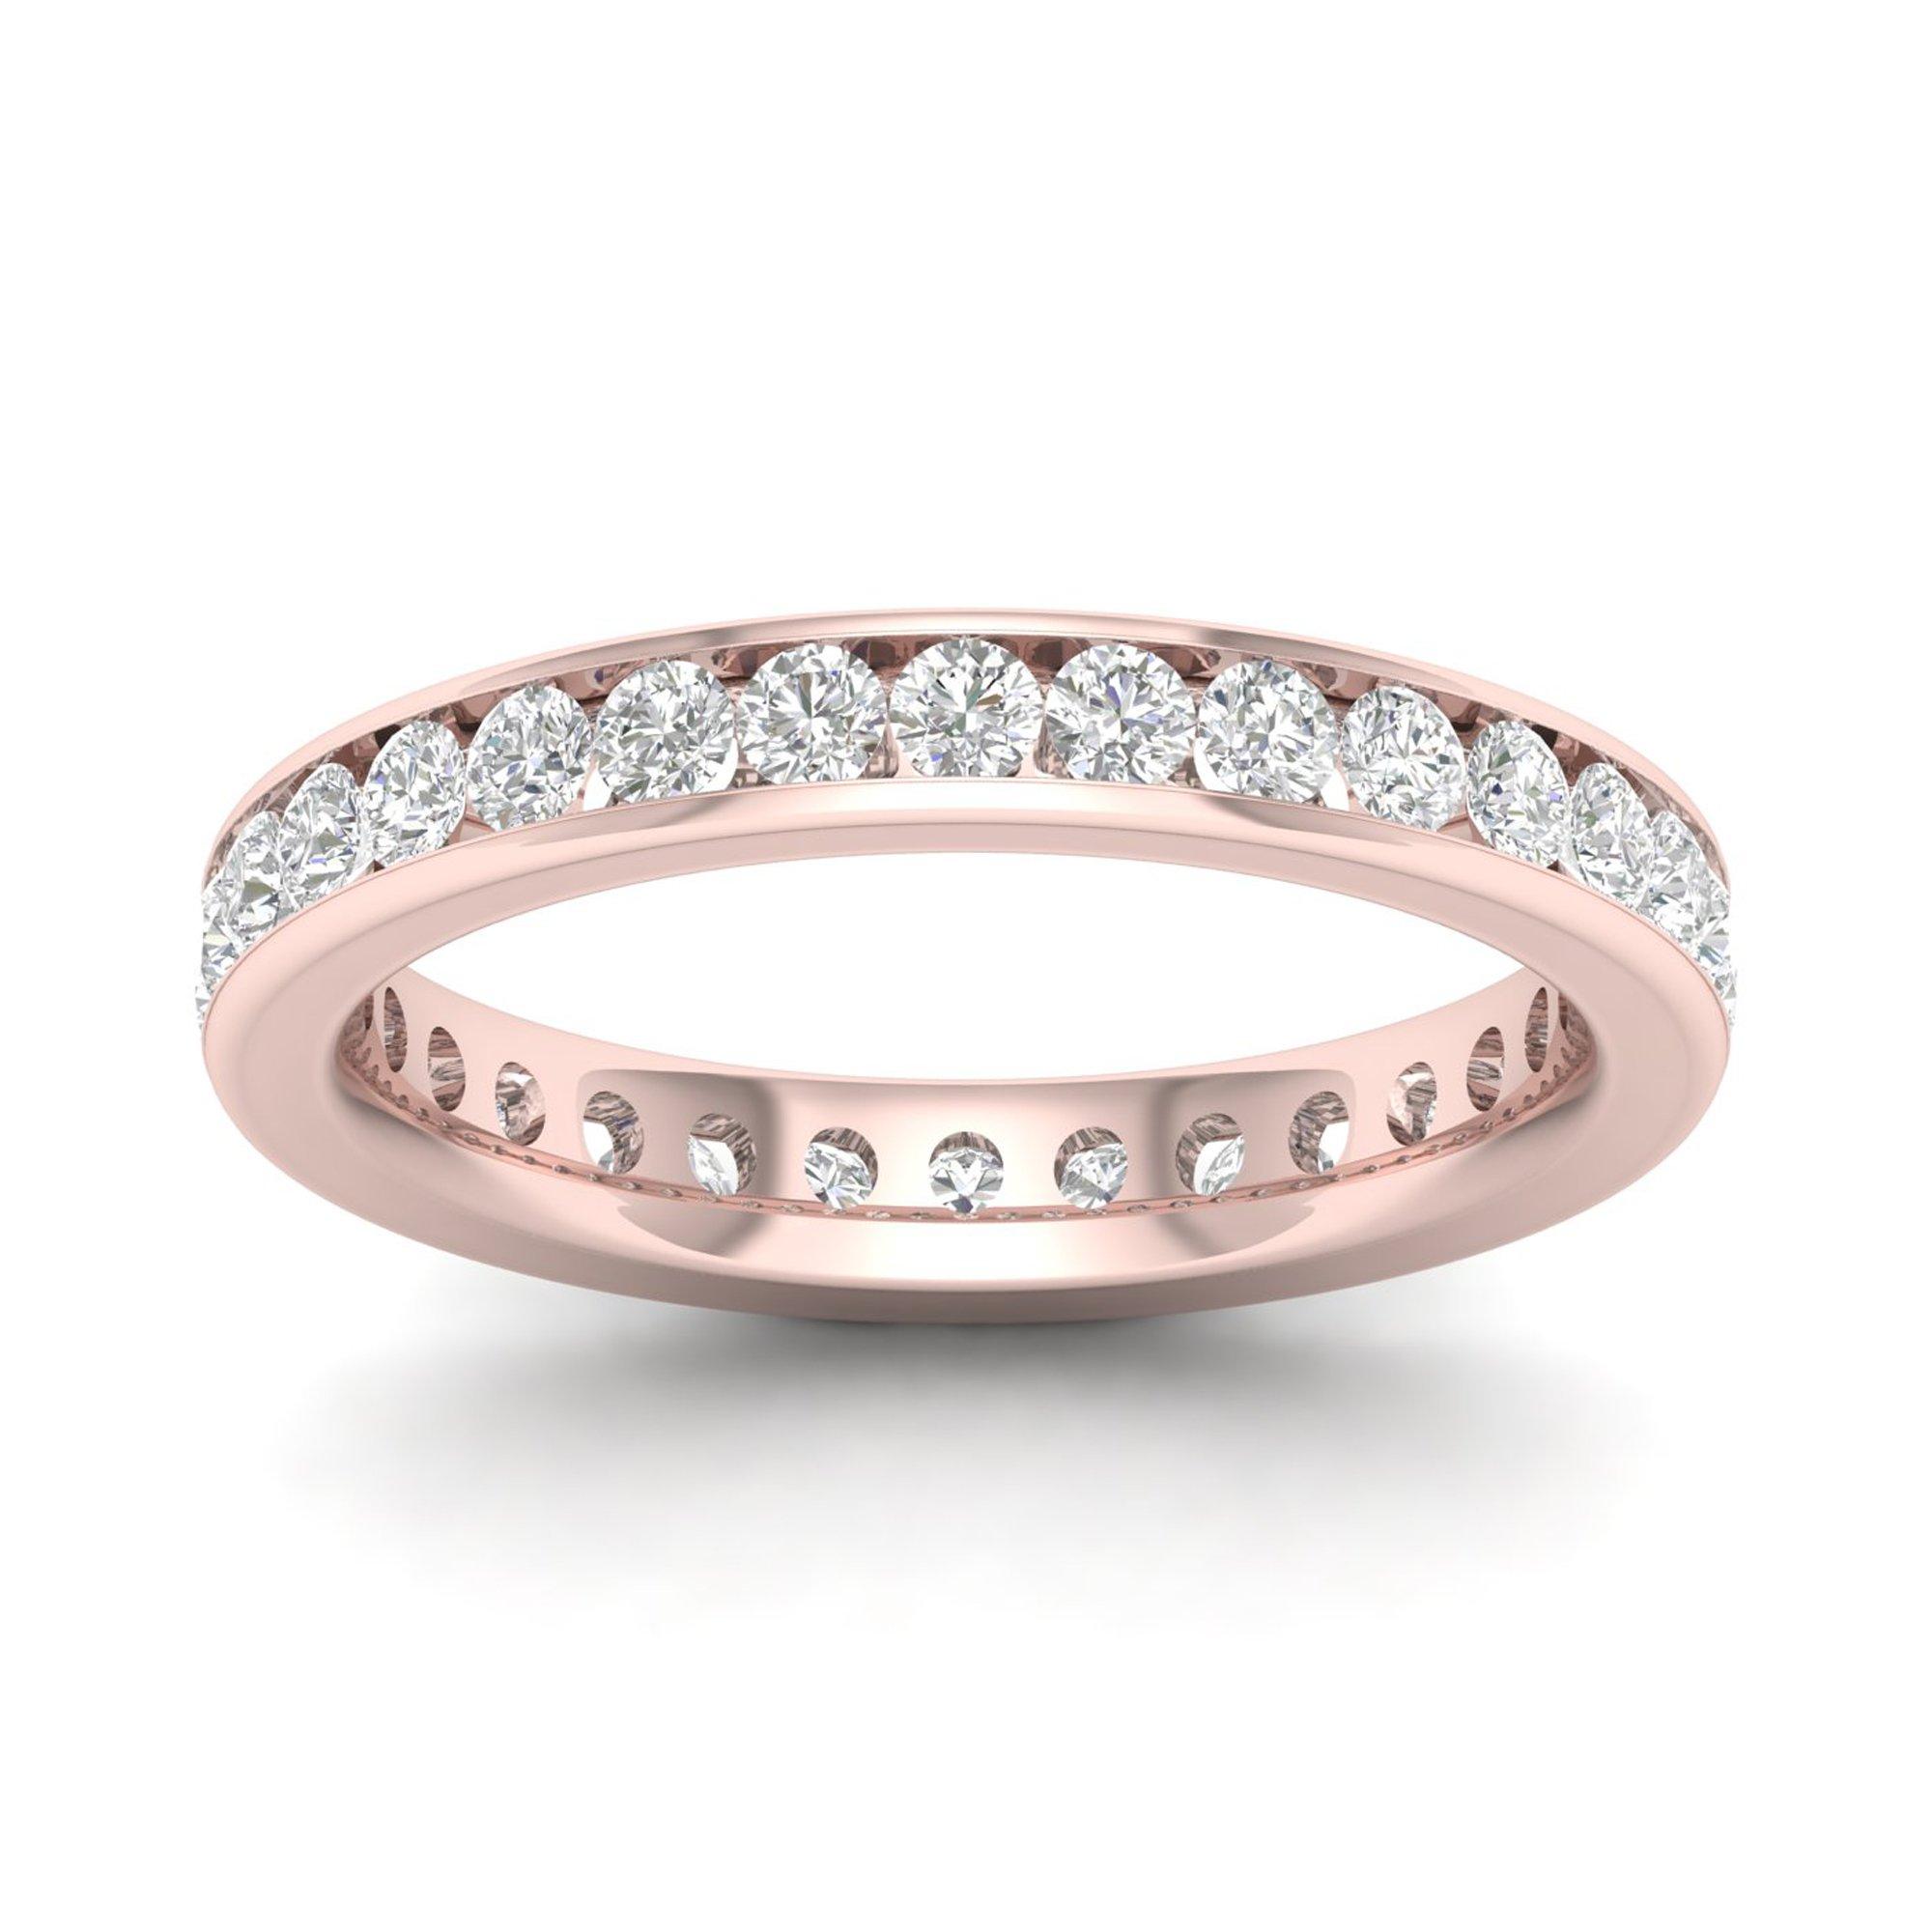 IGI Certified 14k Rose Gold 1 ct TDW Diamond Eternity Wedding Band (H-I, I2) by Diamond Hub